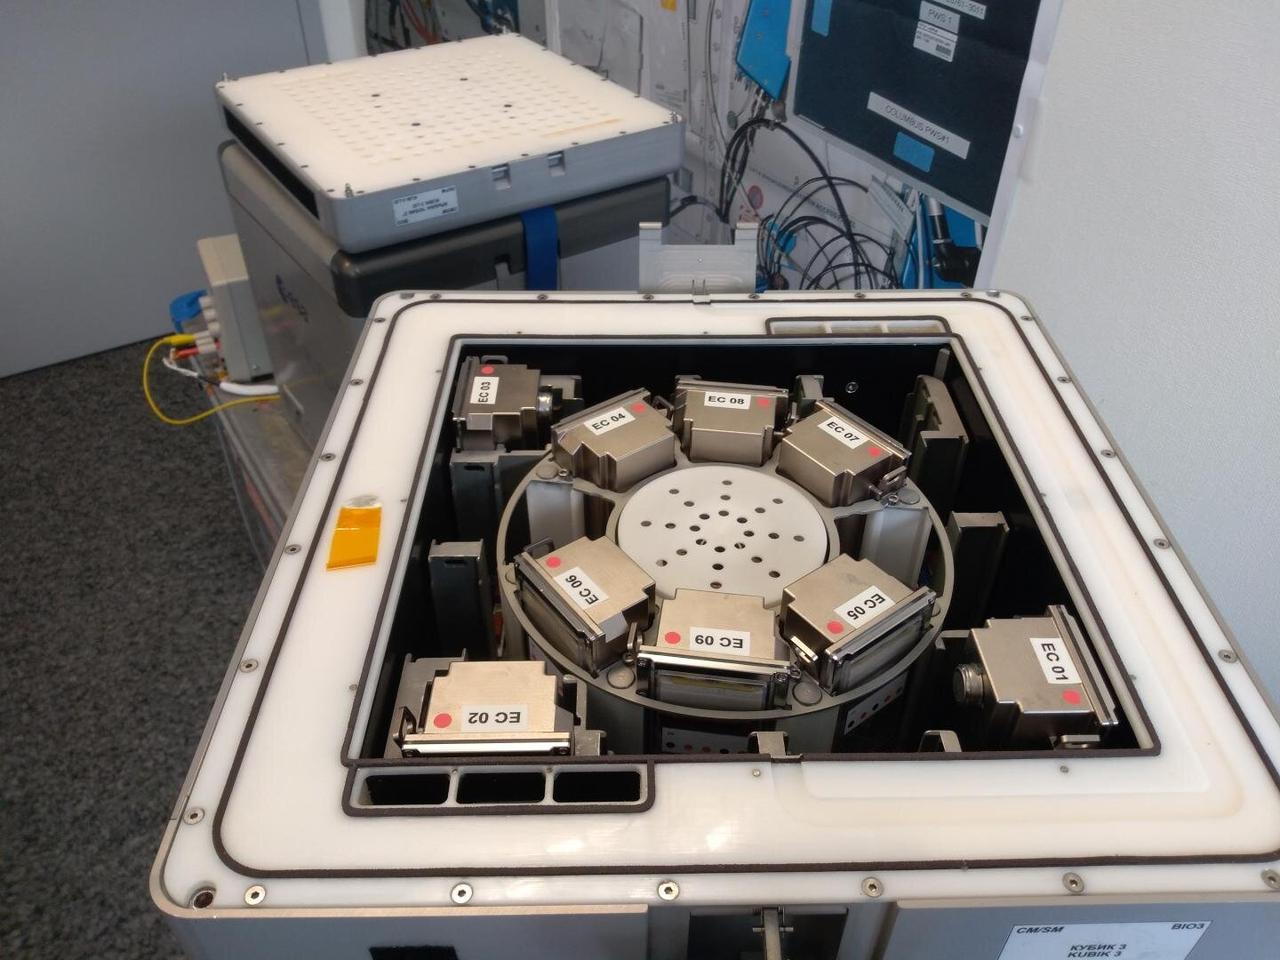 Biomining reactors loaded into incubators